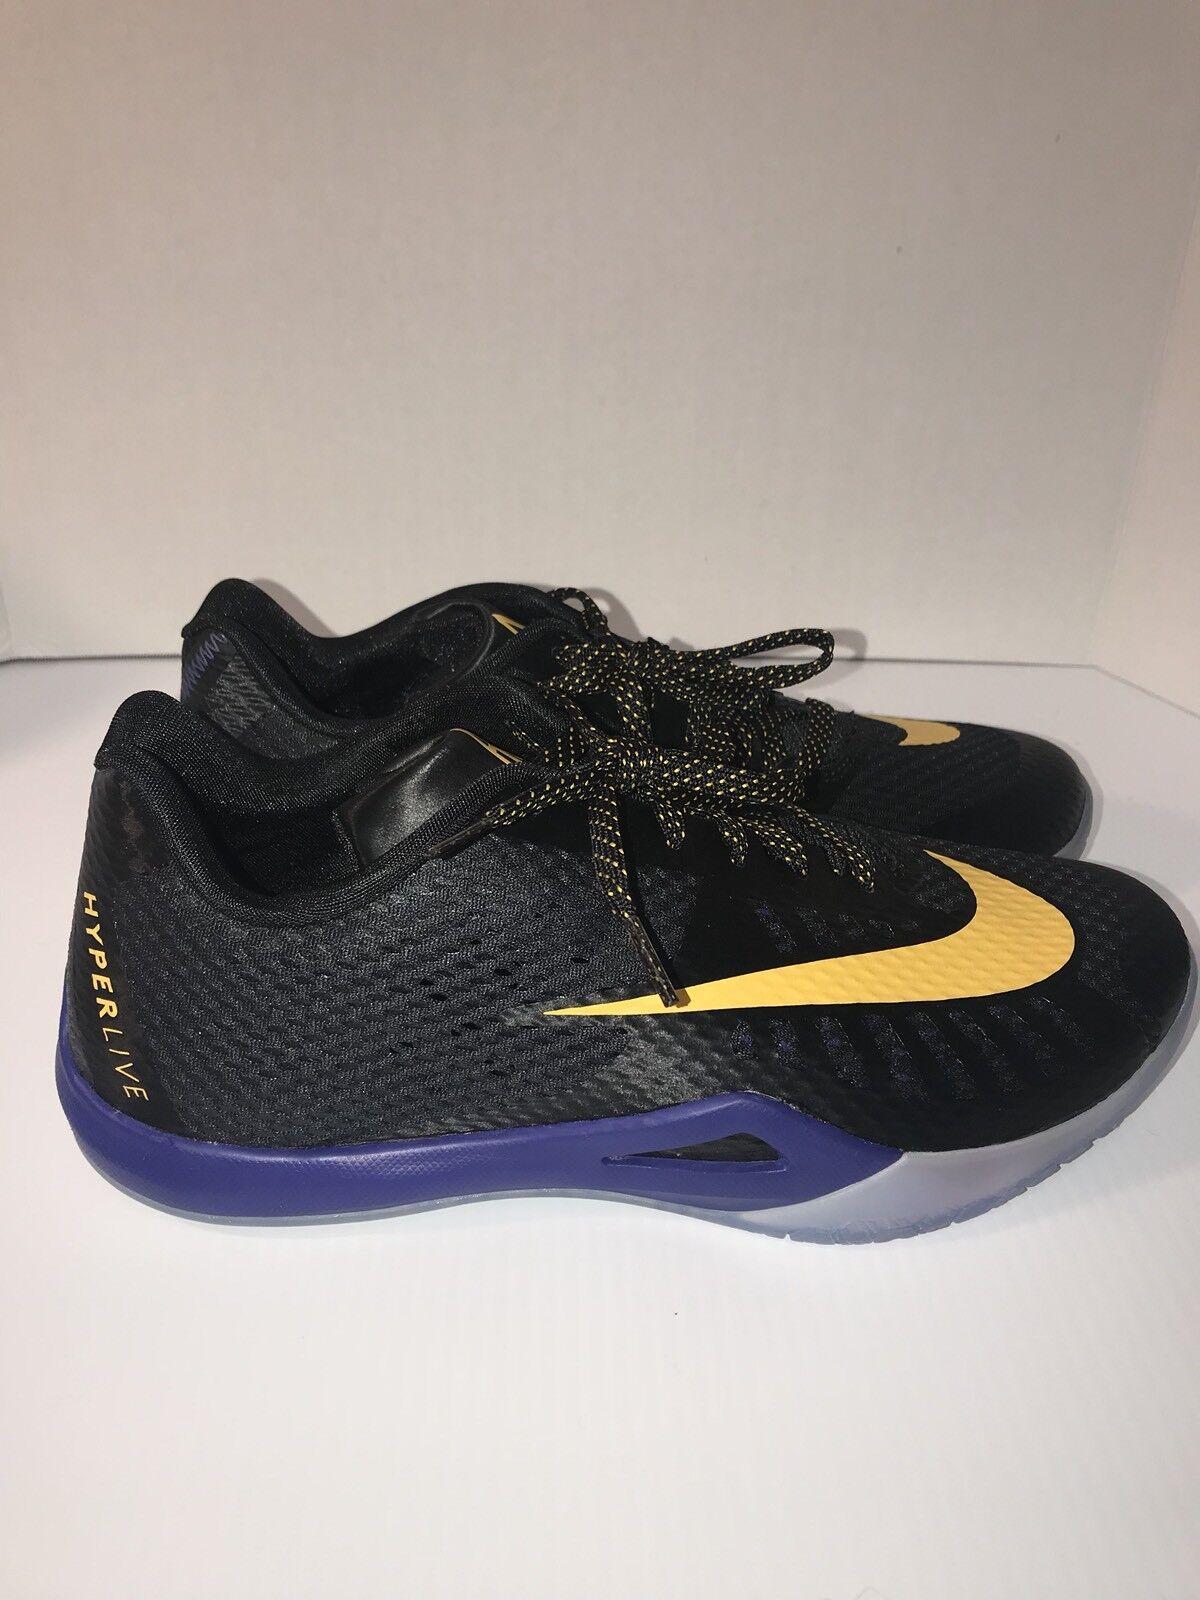 NEW Nike Hyperlive PE Andre Iguodala Basketball shoes 864129-074 Men's Size 11